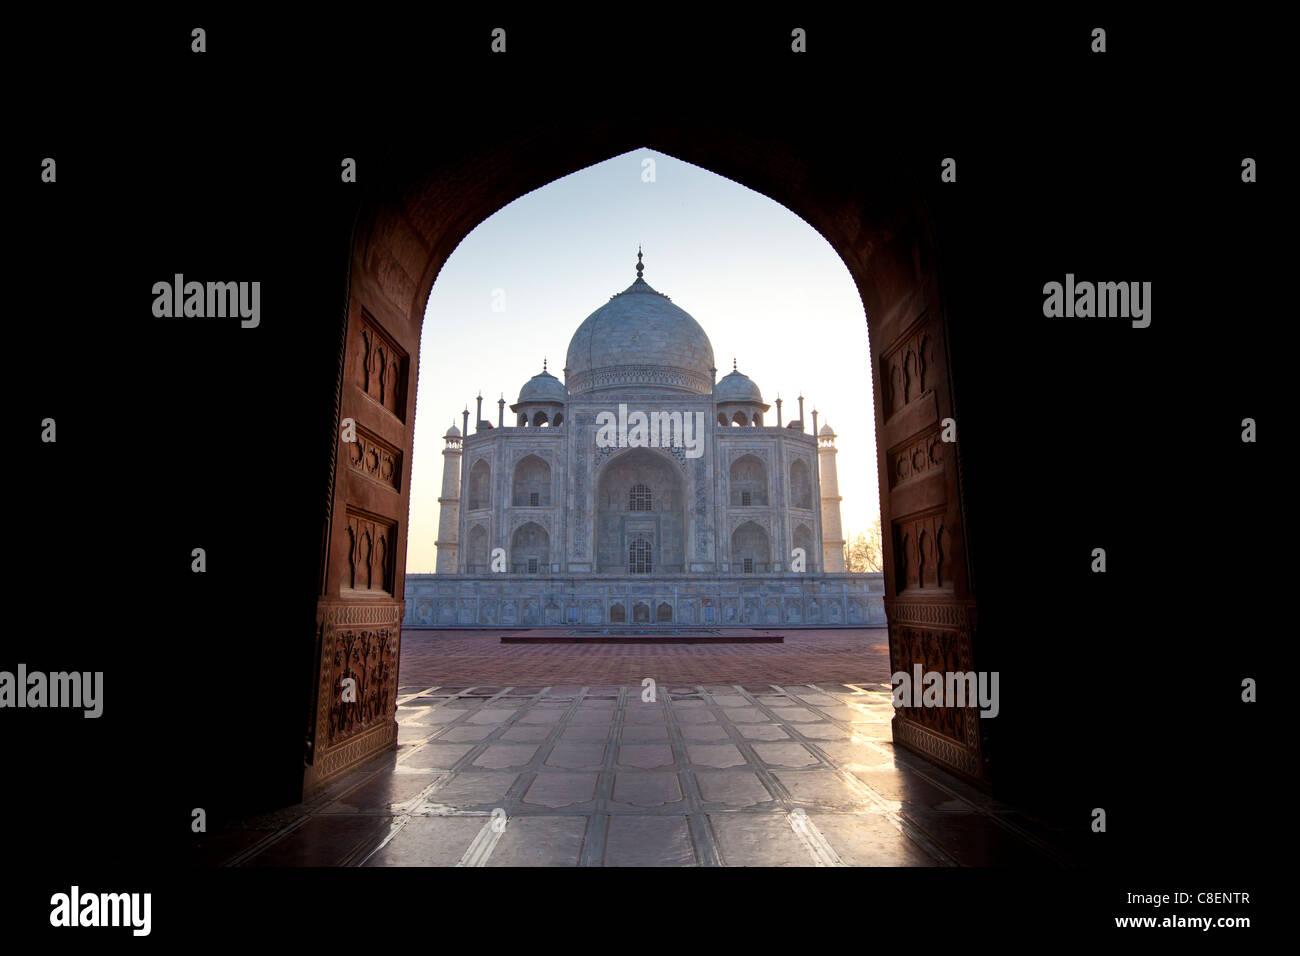 La opinión occidental el mausoleo de Taj Mahal Taj Mahal (visto desde la Mezquita) al amanecer, Uttar Pradesh, Imagen De Stock